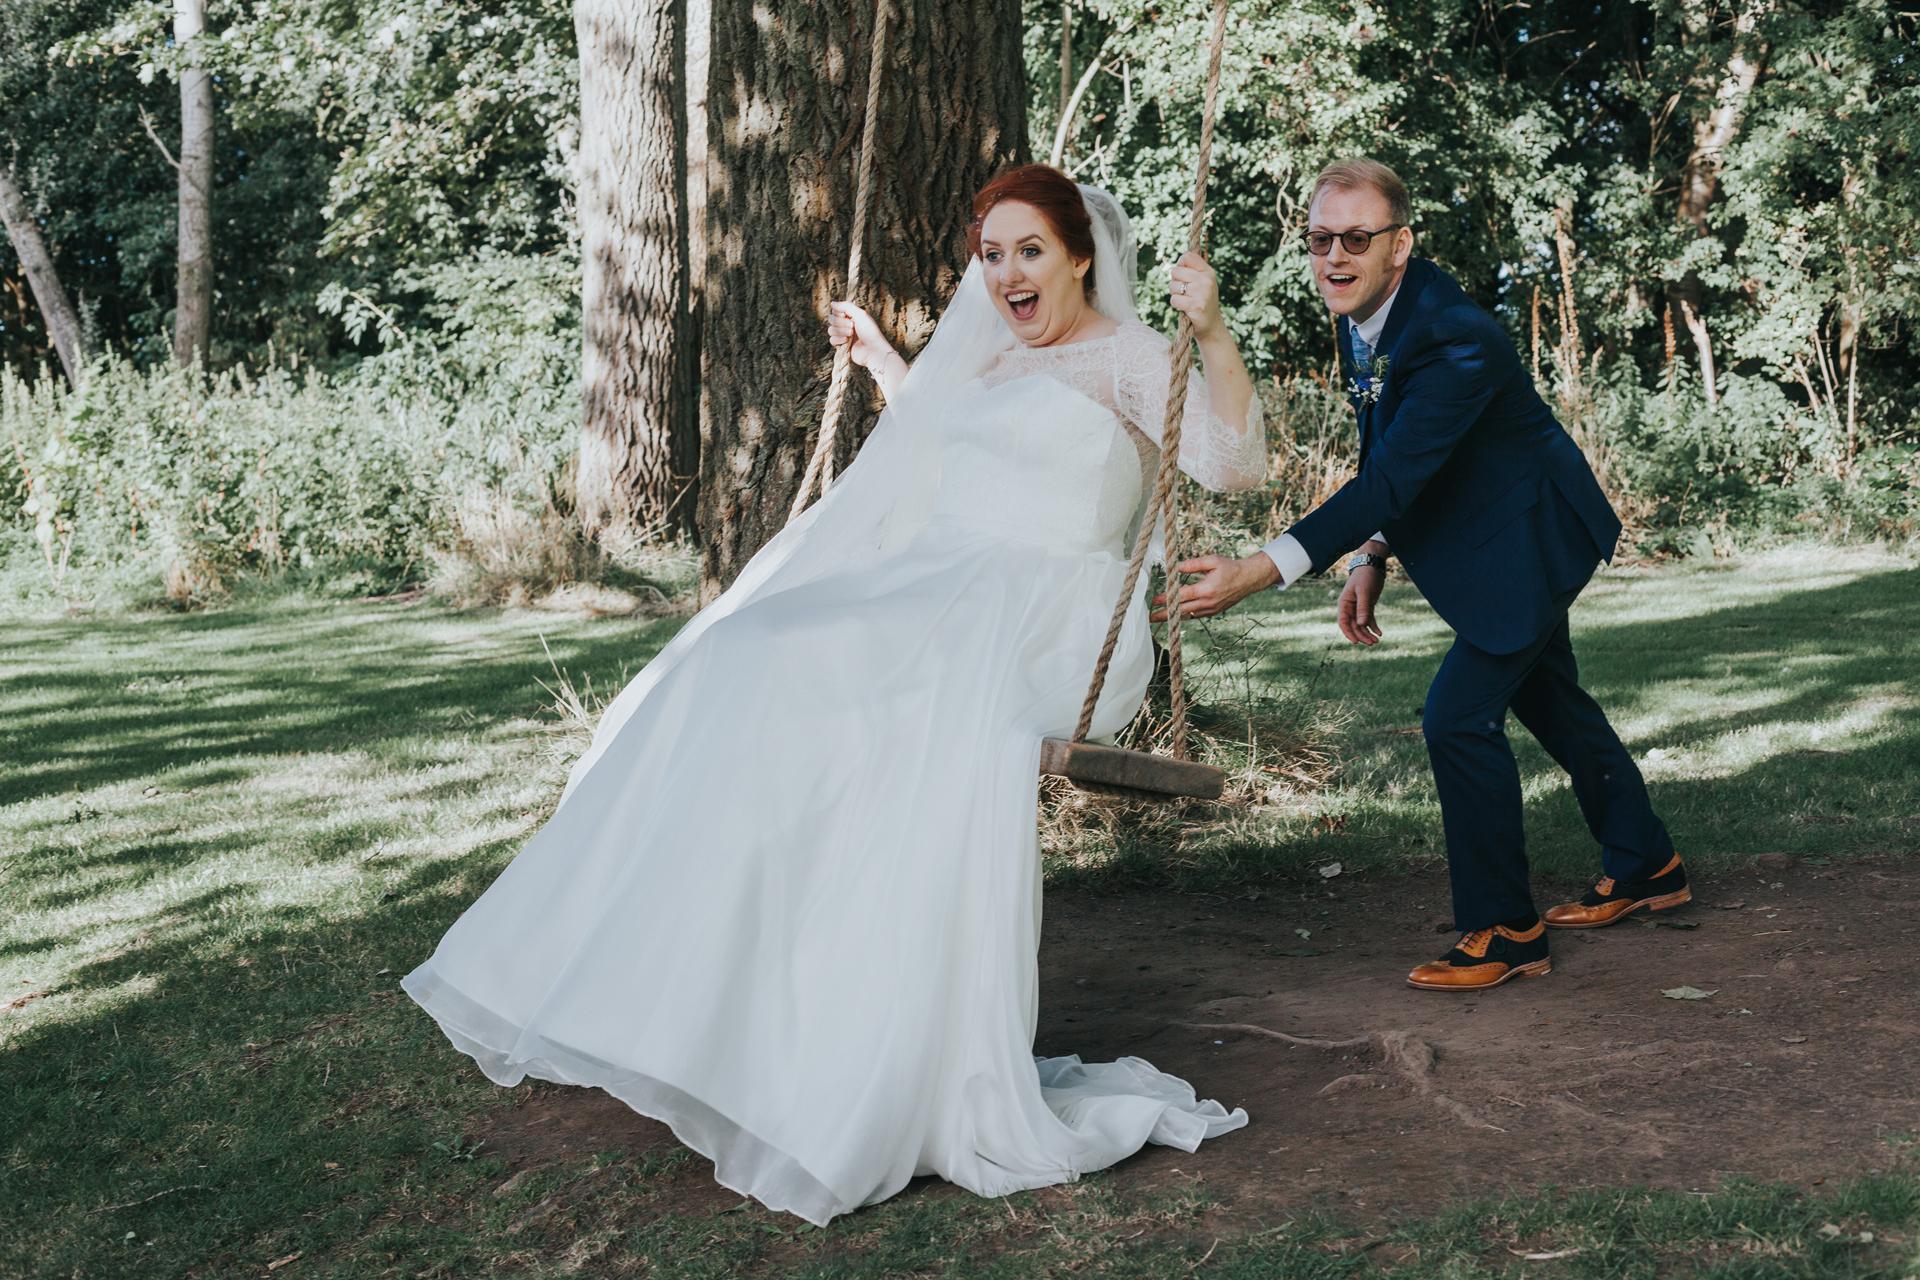 Groom pushes bride on swing.